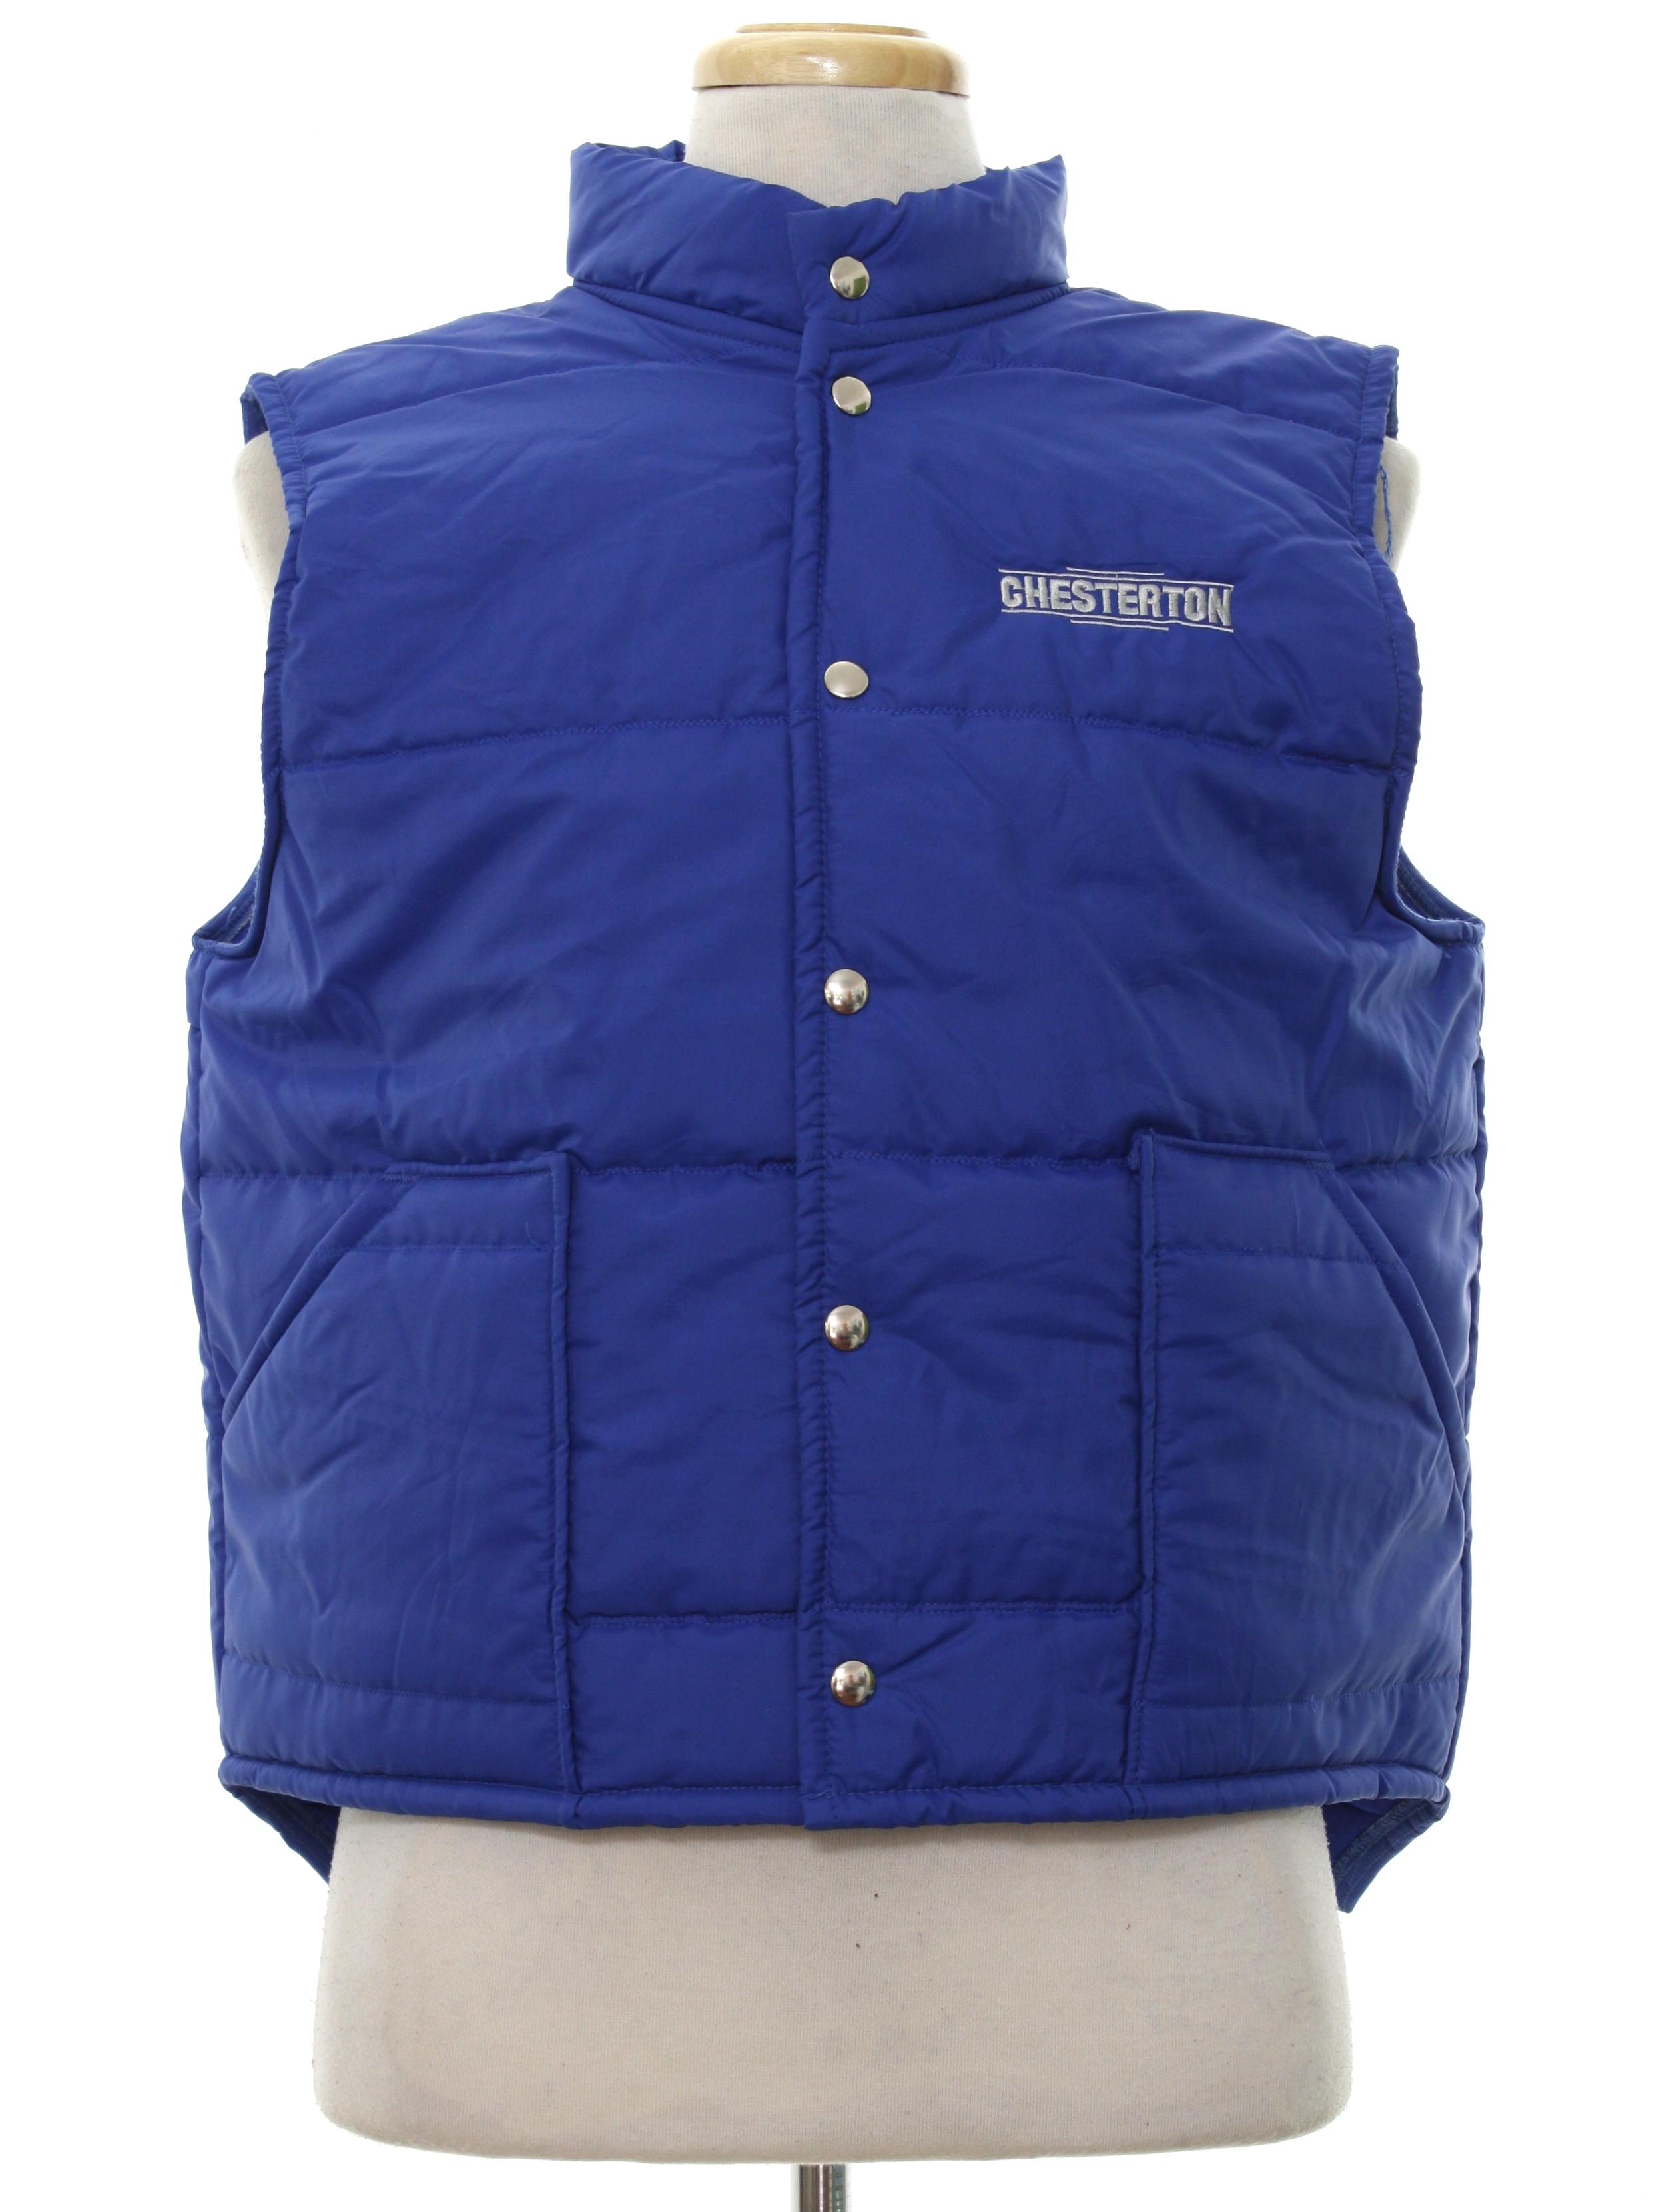 Vintage 1980 S Jacket 80s Pla Jac Mens Quilted Royal